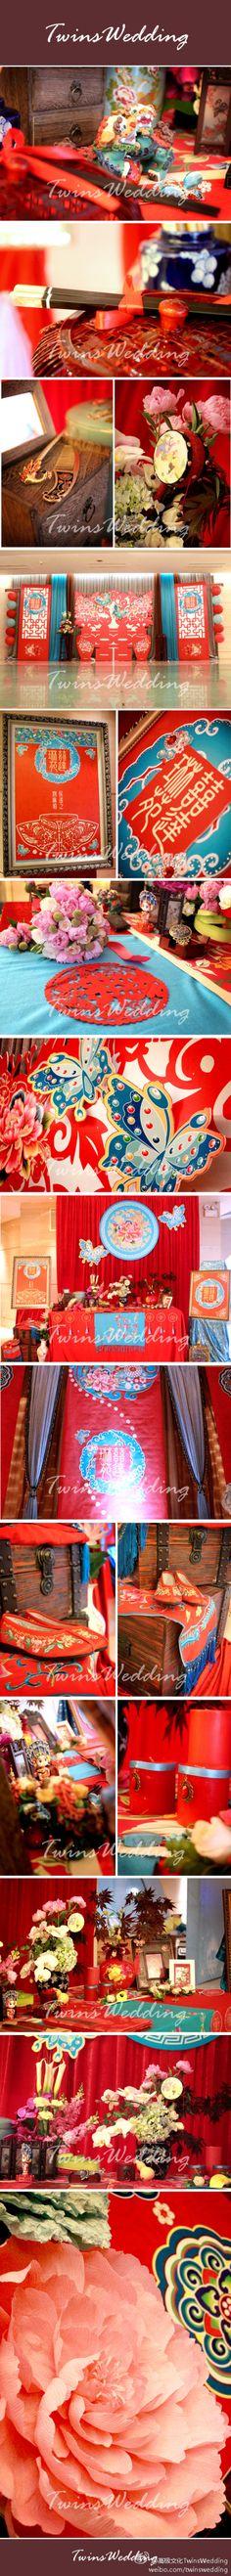 102 Best Wedding Oriental Images On Pinterest In 2018 Oriental